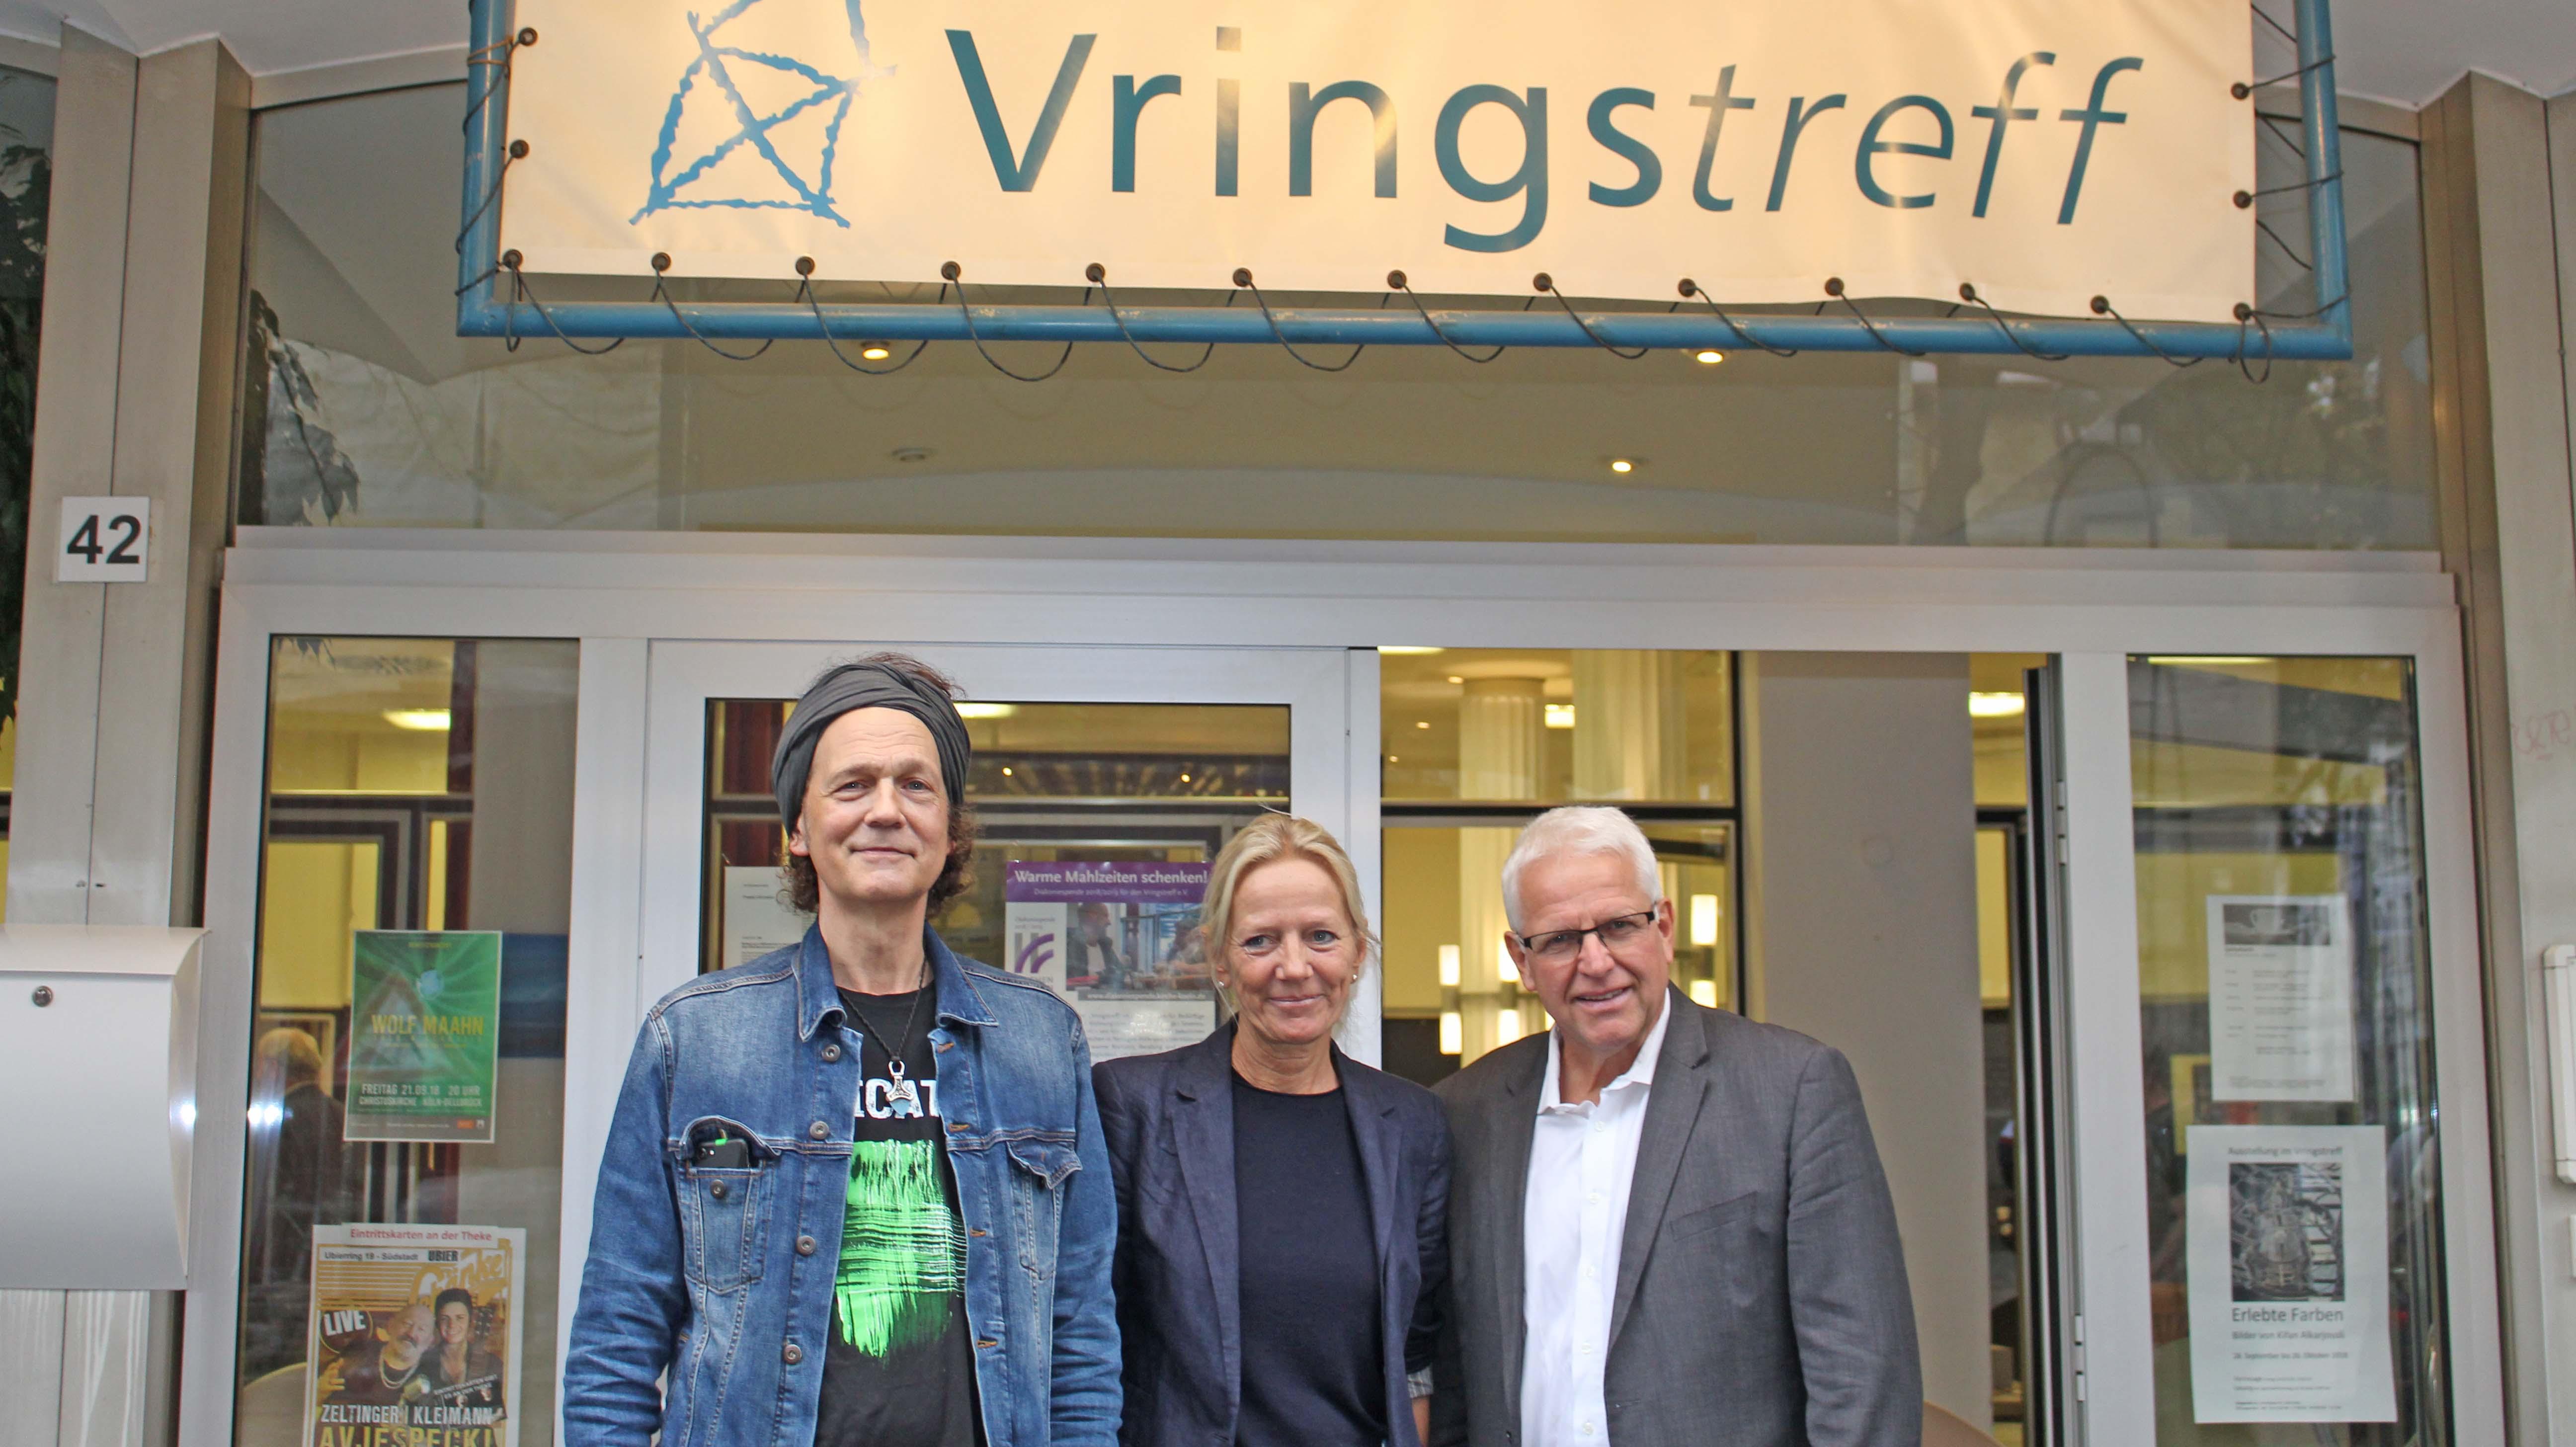 Wolf Maahn, Jutta Eggeling, Rolf Domning